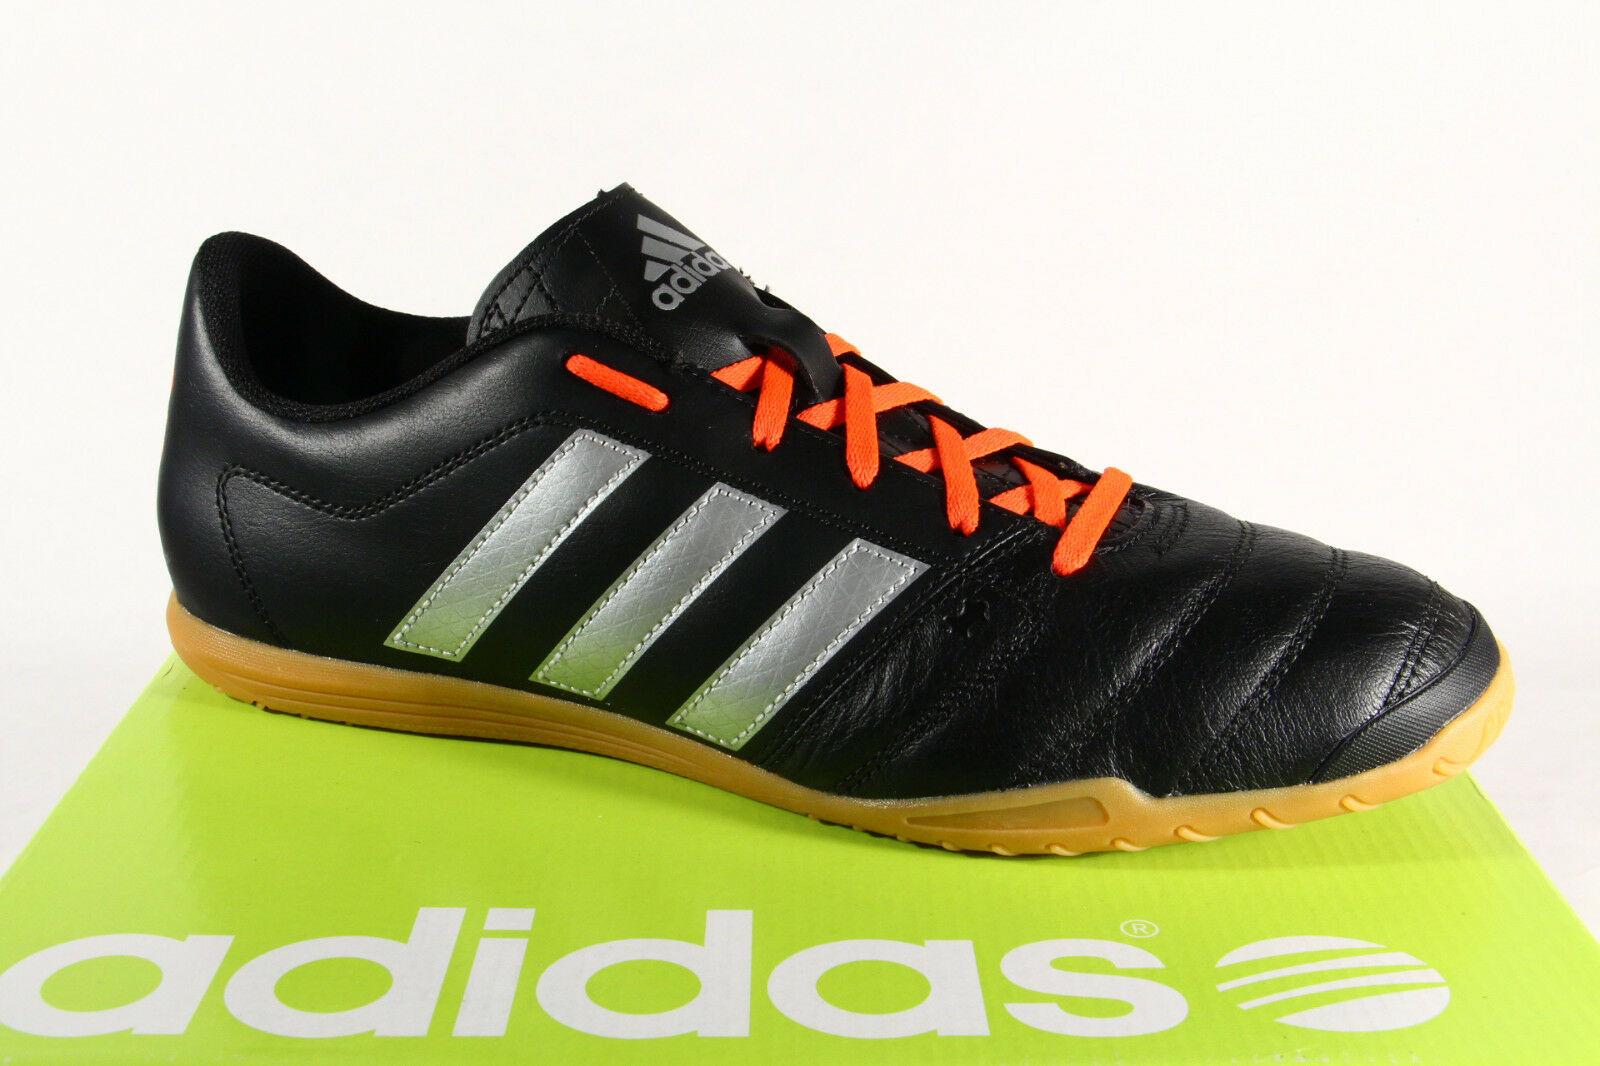 Adidas Herren Sportschuhe Fußballschuhe Turnschuhe Turnschuhe schwarz NEU